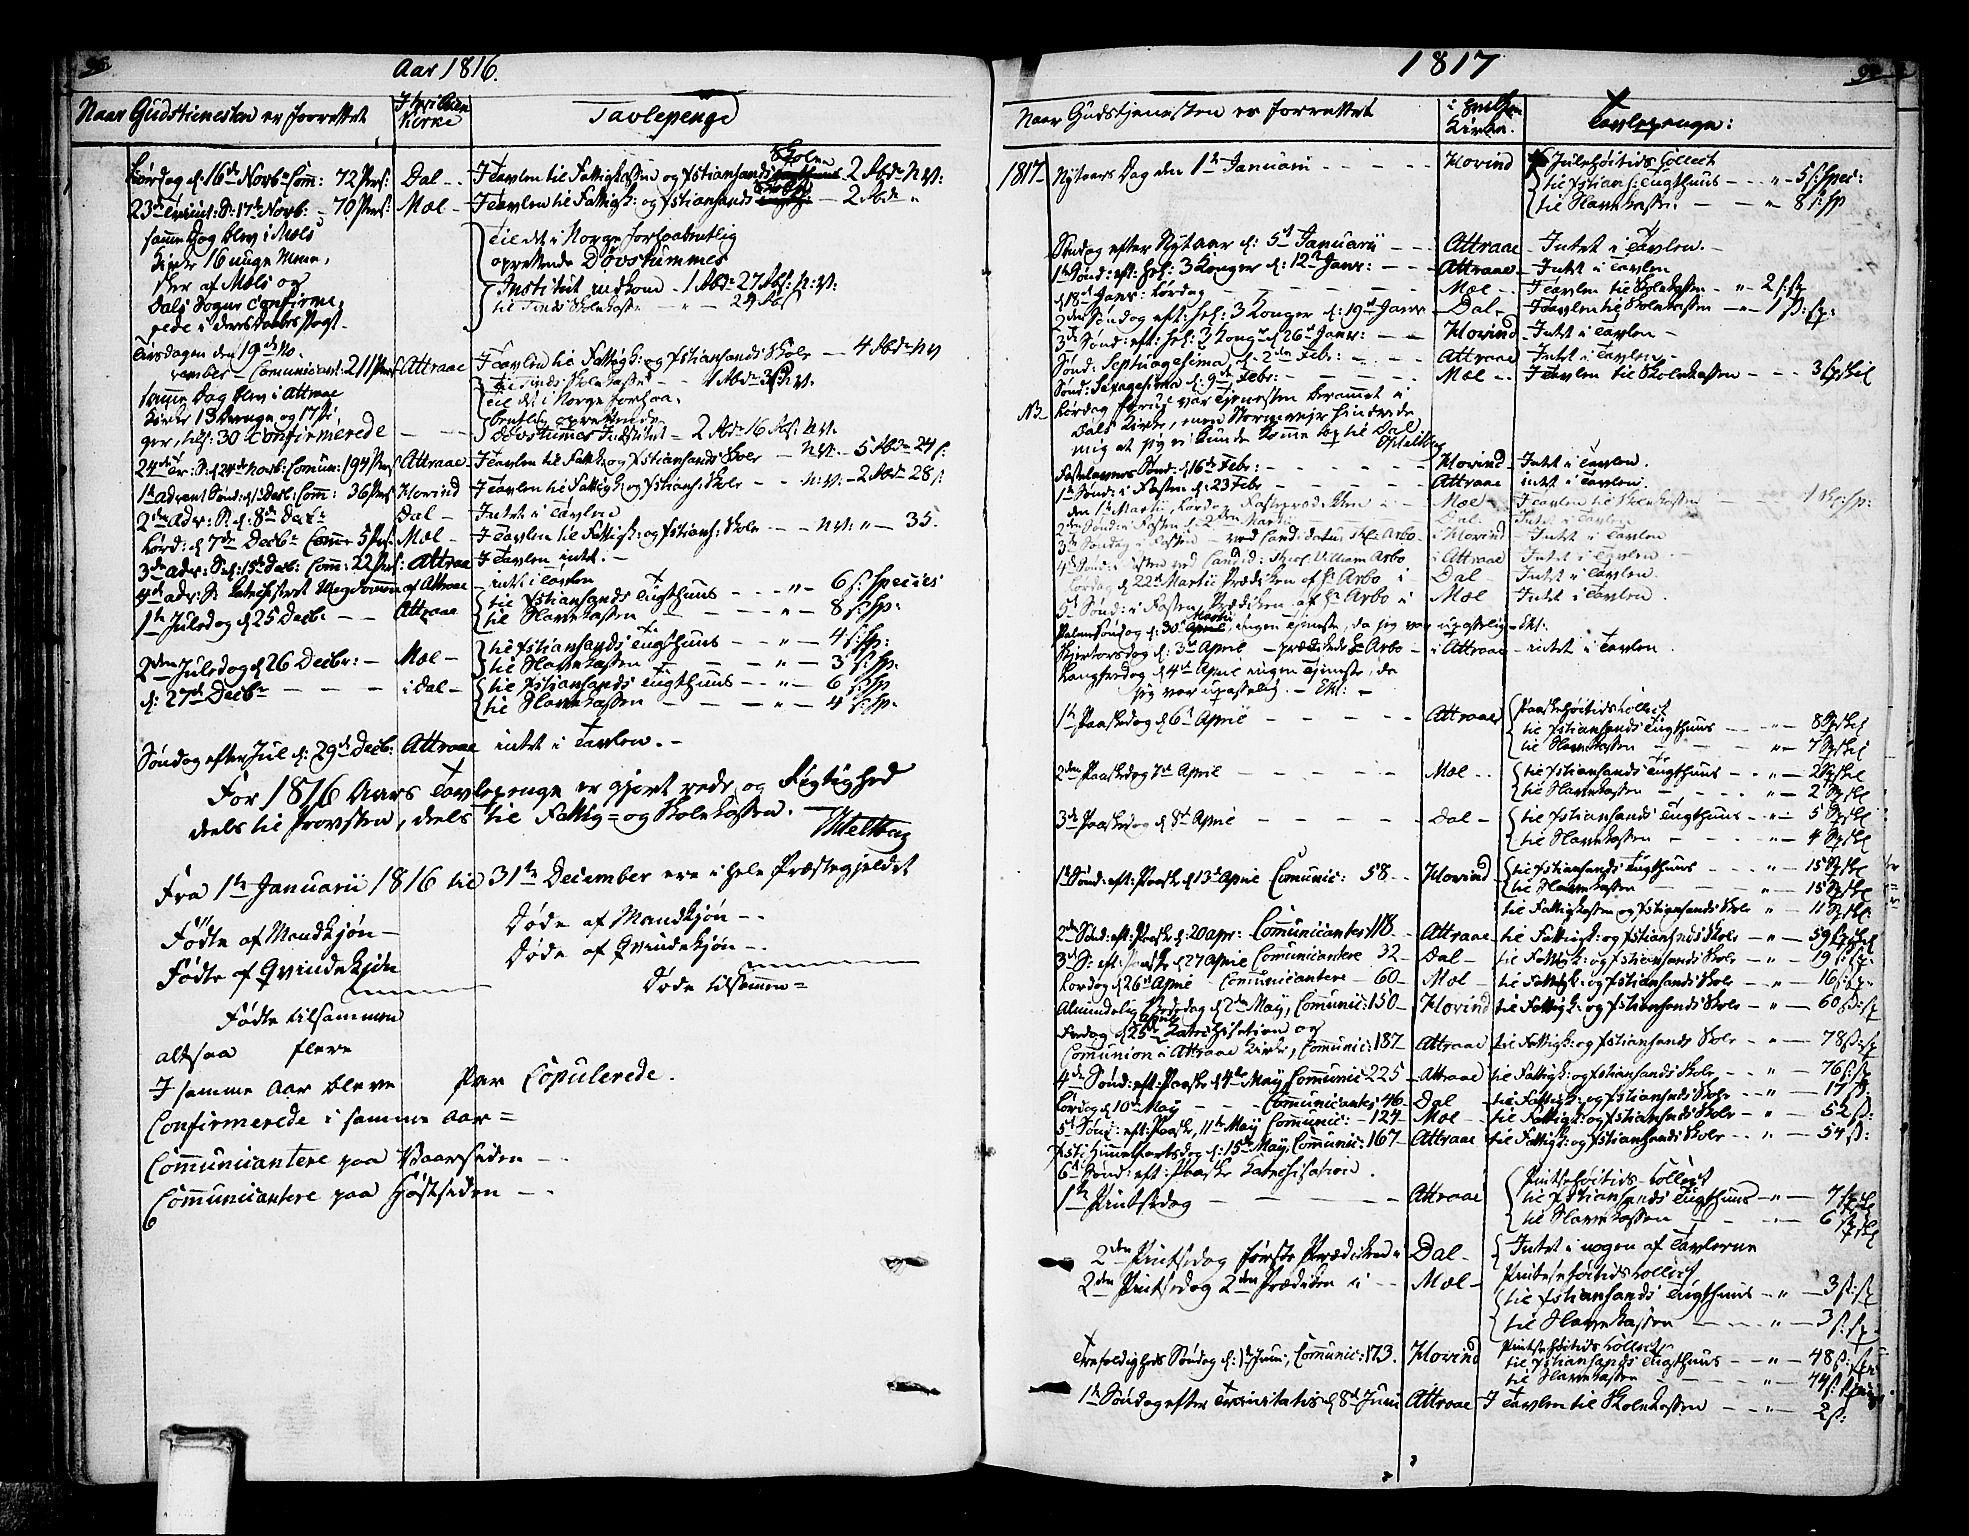 SAKO, Tinn kirkebøker, F/Fa/L0003: Ministerialbok nr. I 3, 1810-1814, s. 96-97